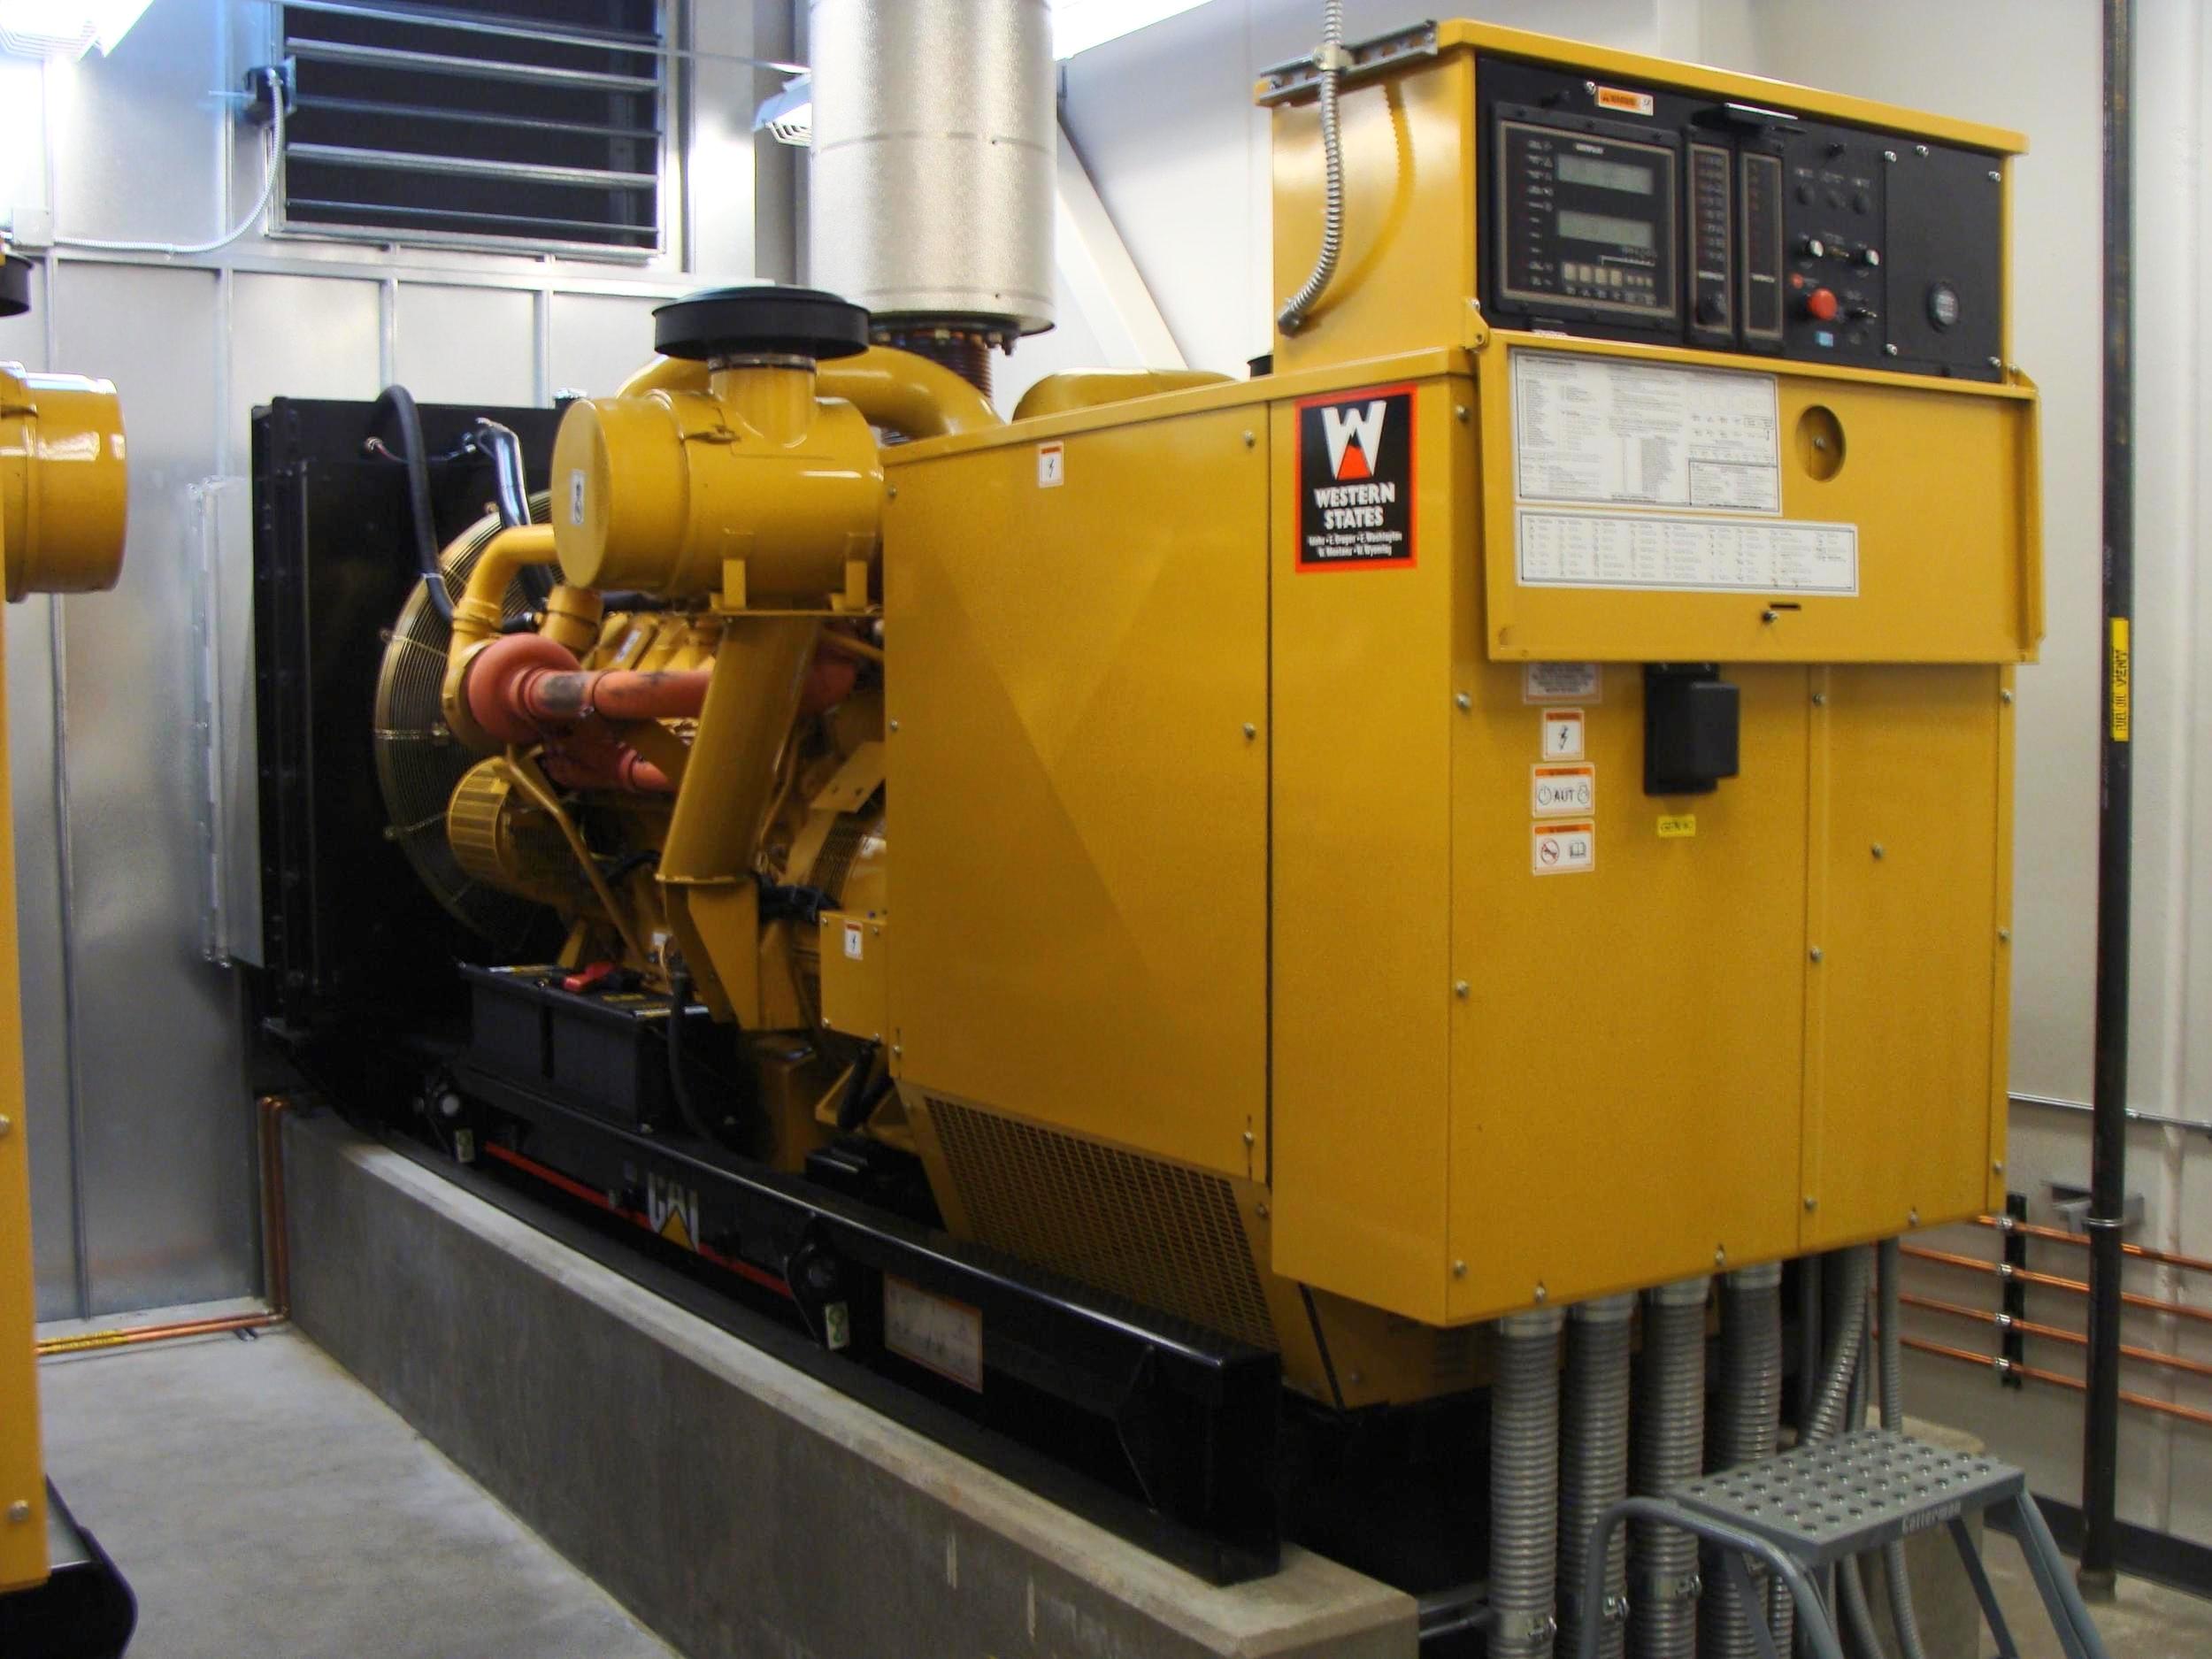 830 Valley Hospital central Energy Plant 03.JPG